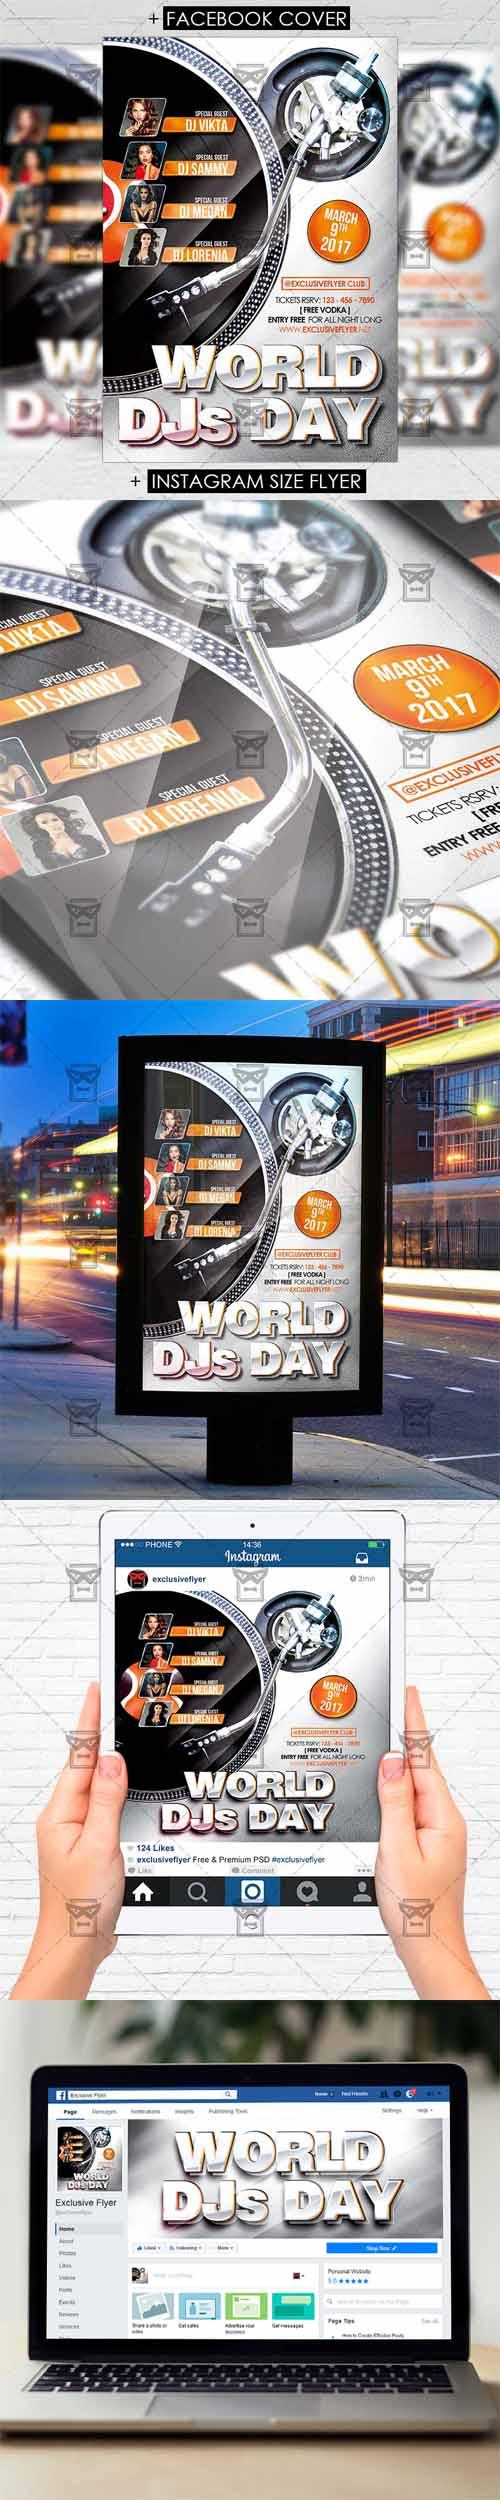 Flyer Template - World DJS Day Vol 2